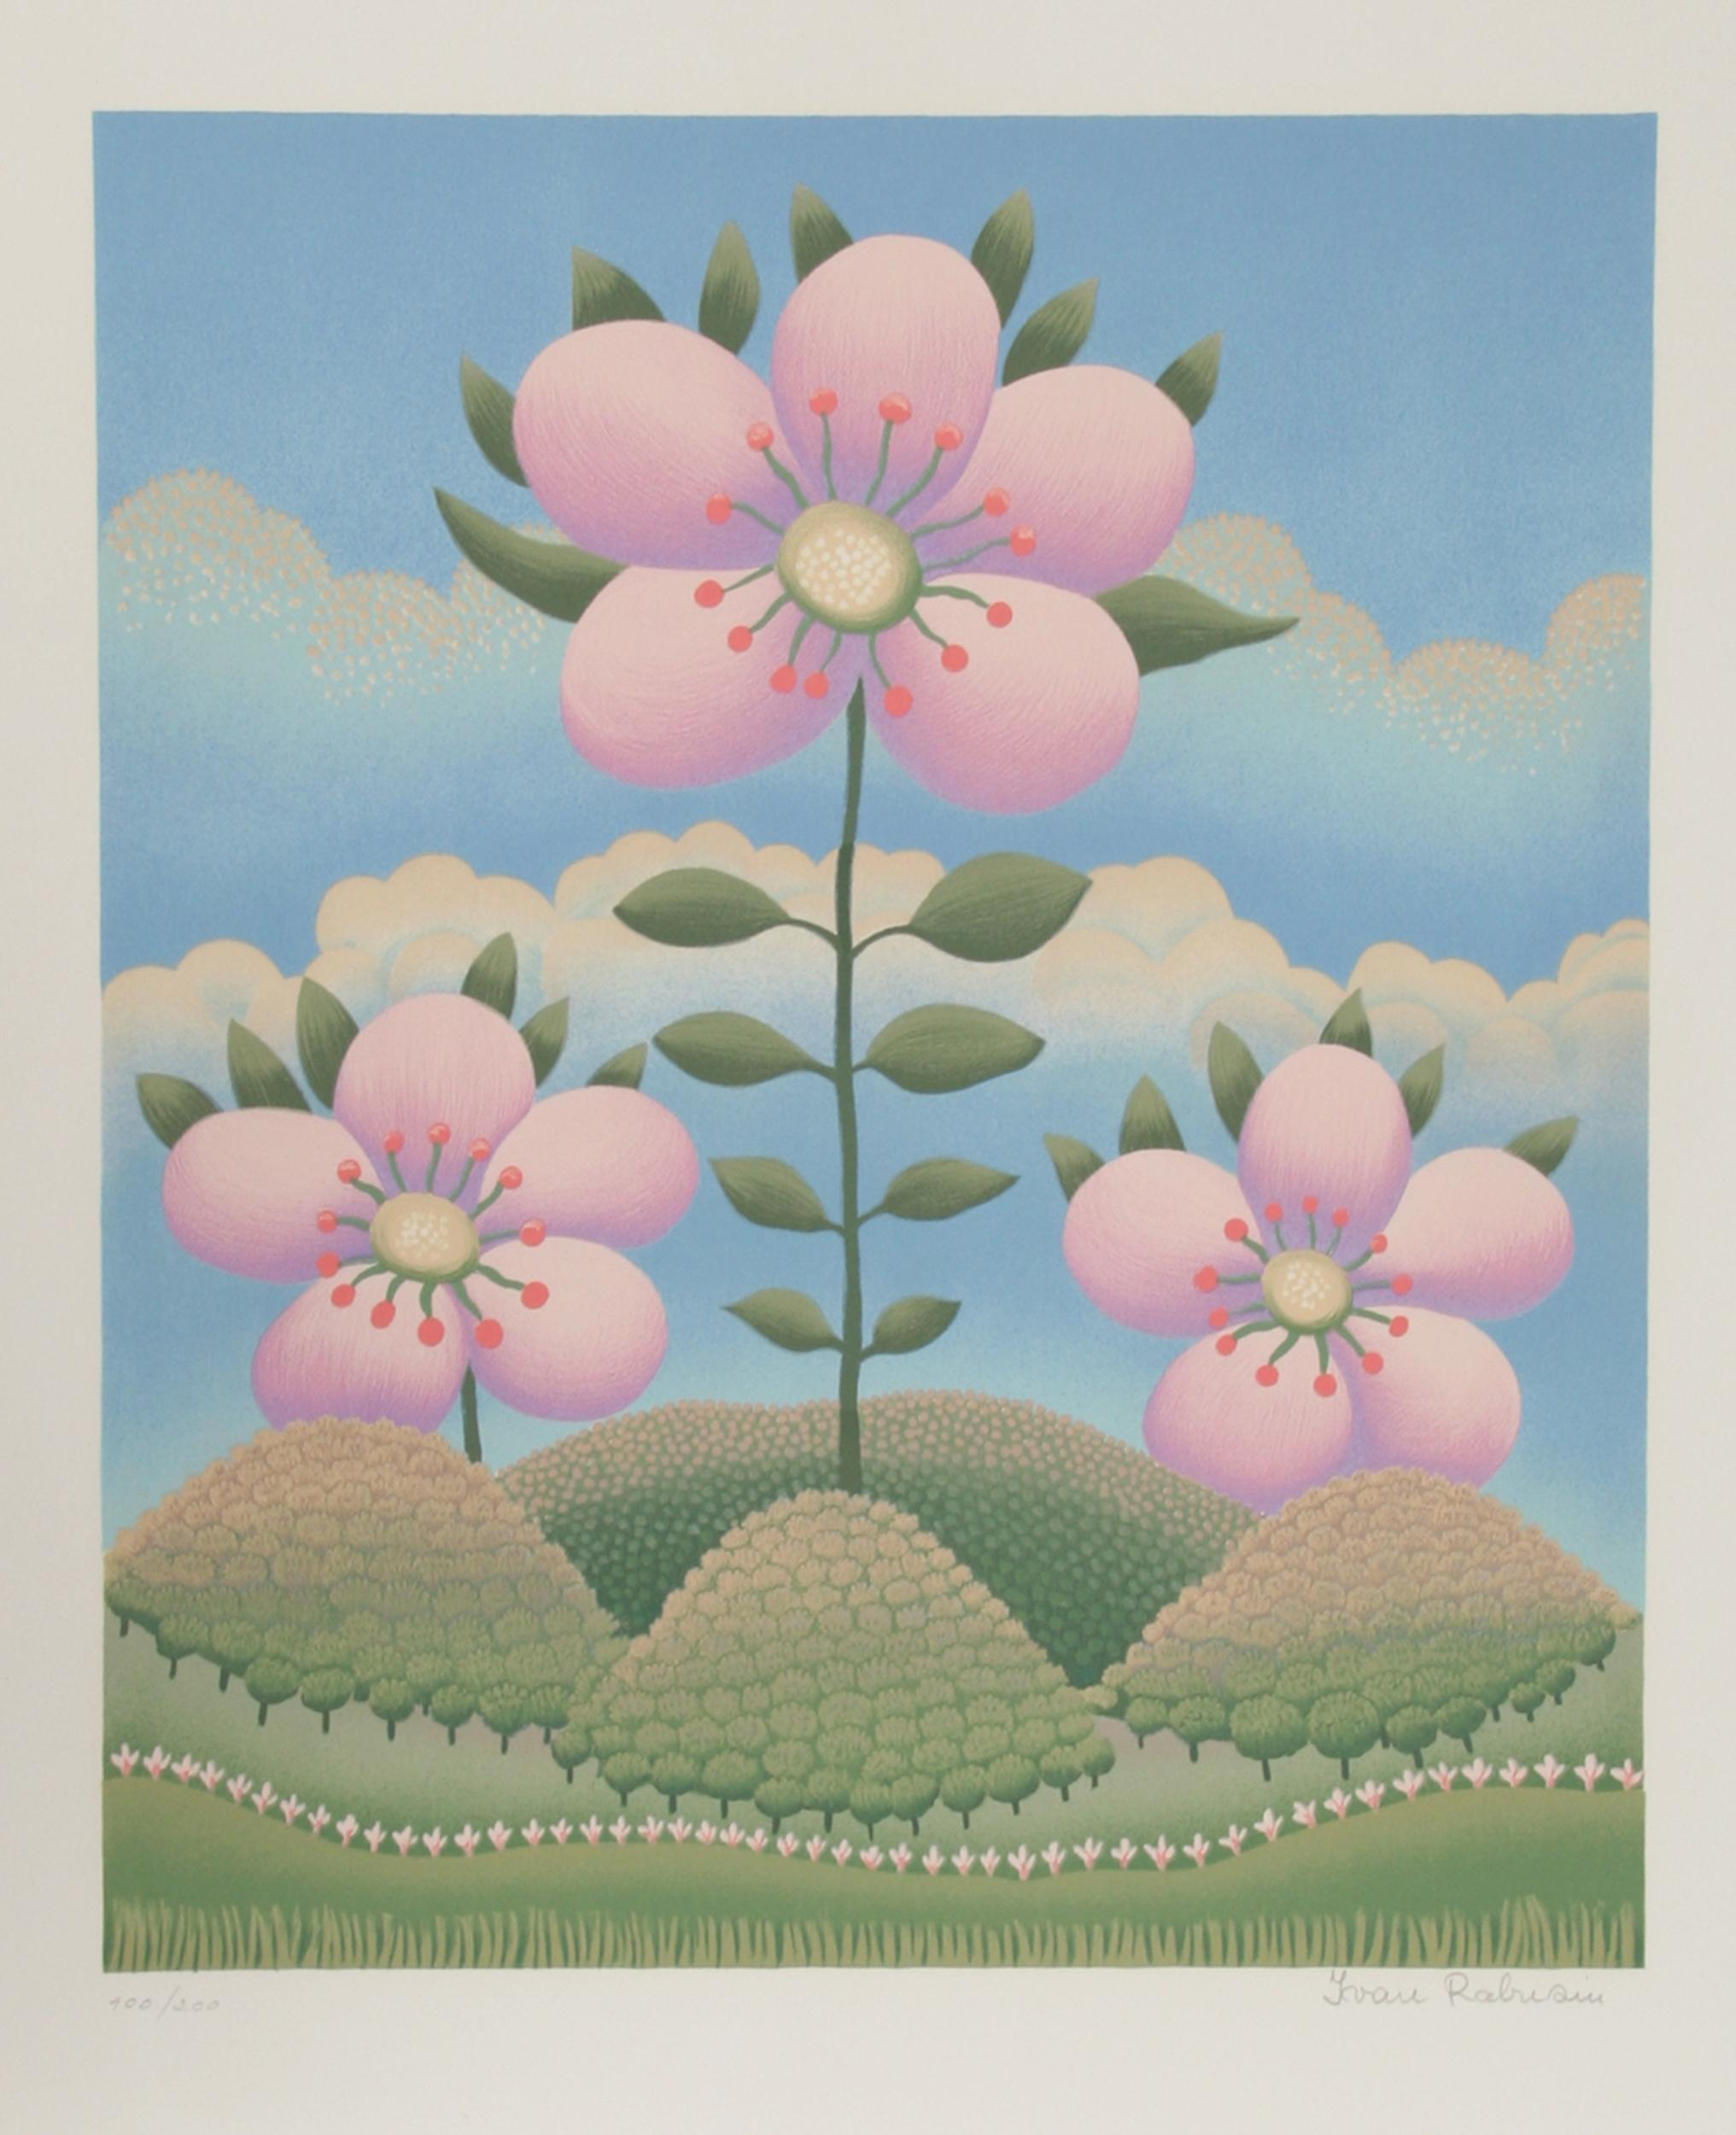 Ivan Rabuzin, Pink Flowers on Hills (6), Serigraph